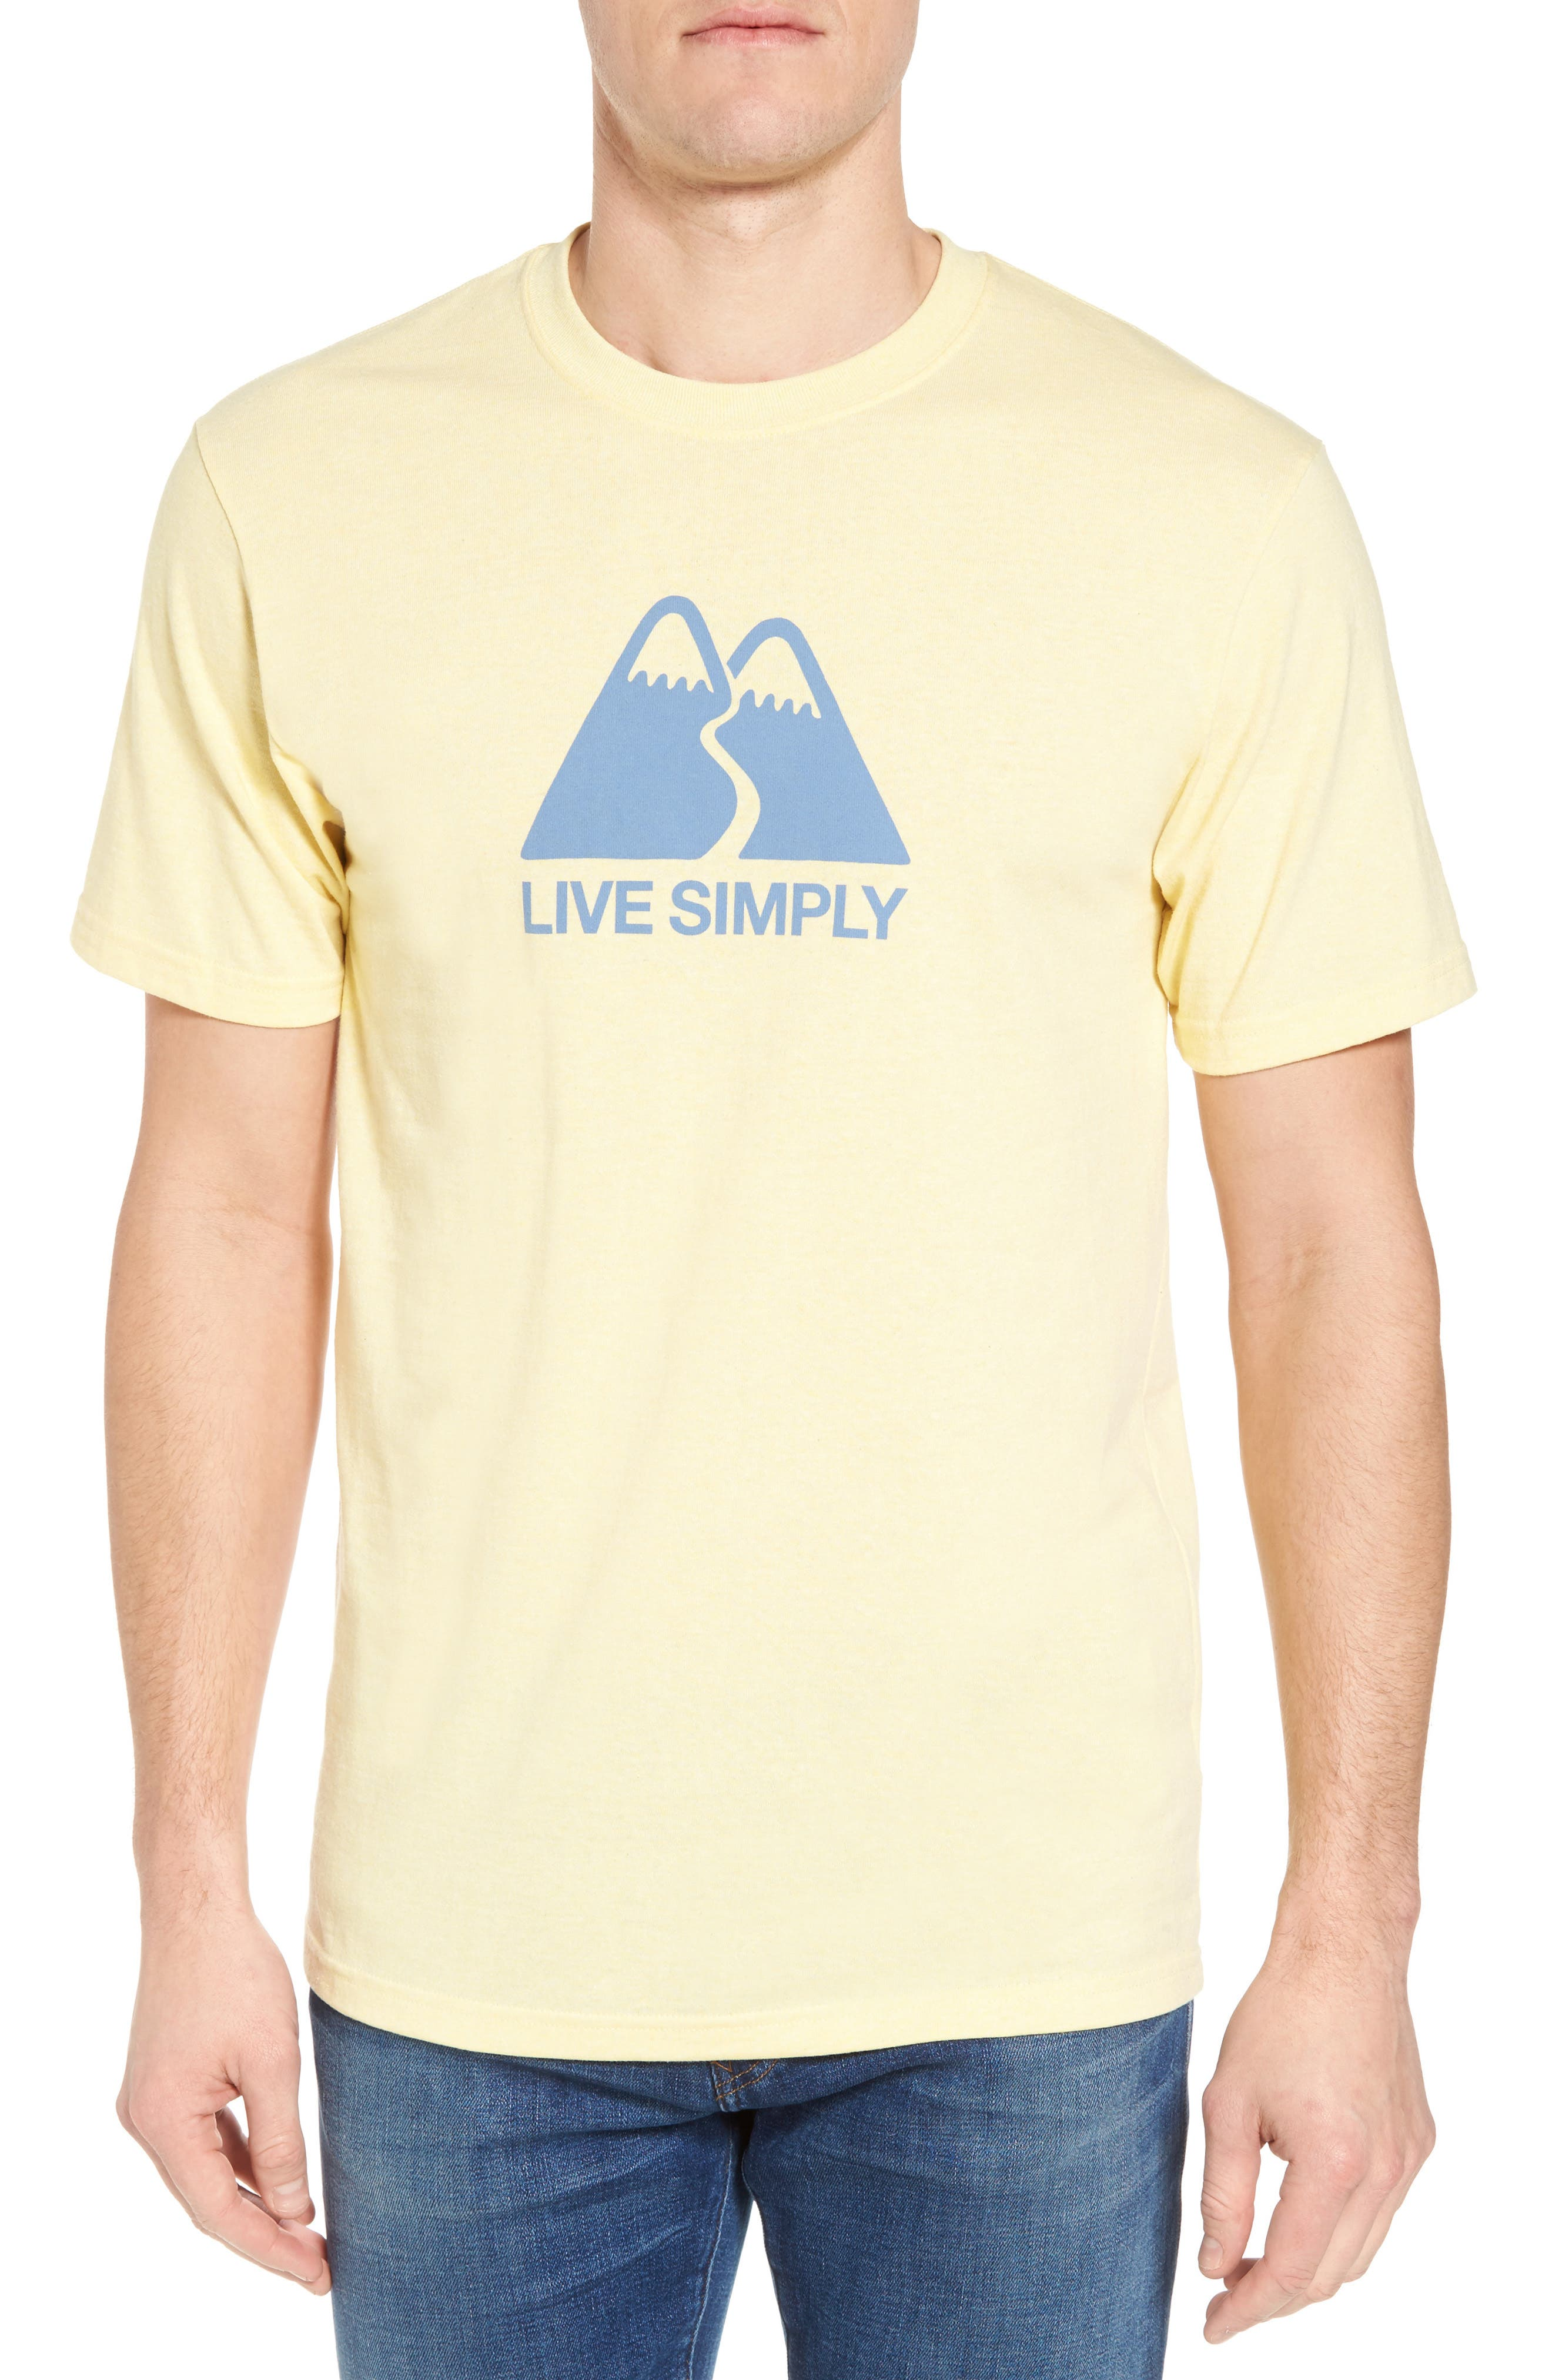 Patagonia Live Simply® Winding Graphic Responsibili-Tee T-Shirt